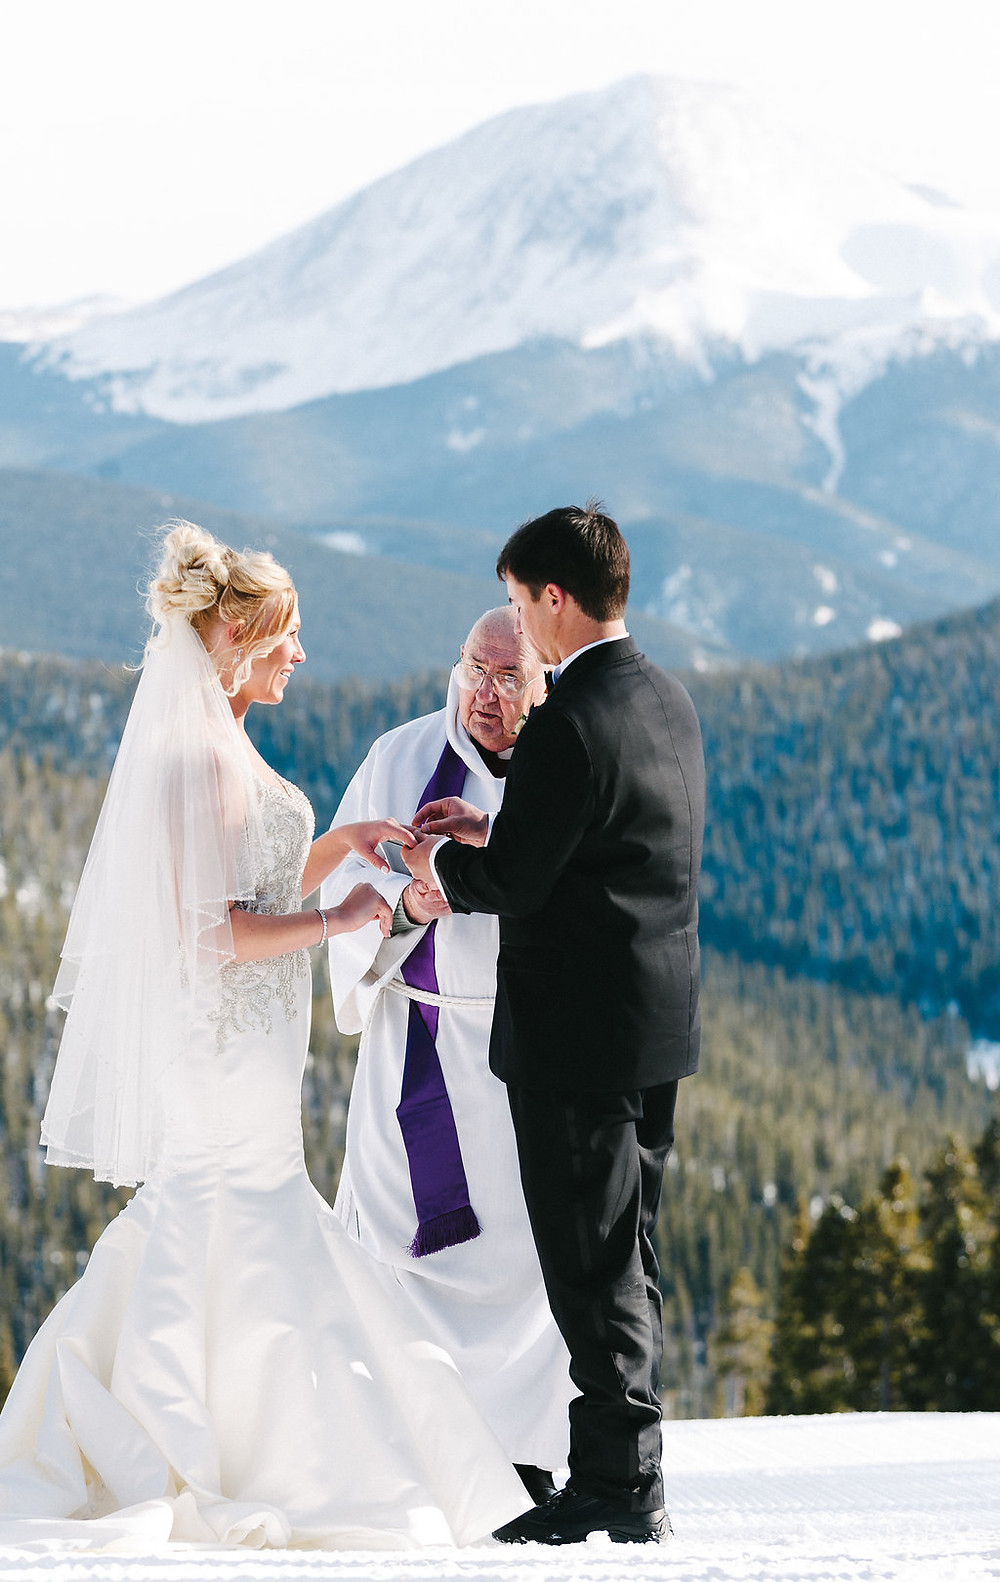 Colorado Winter Wedding - Keystone Winter Wedding Planner